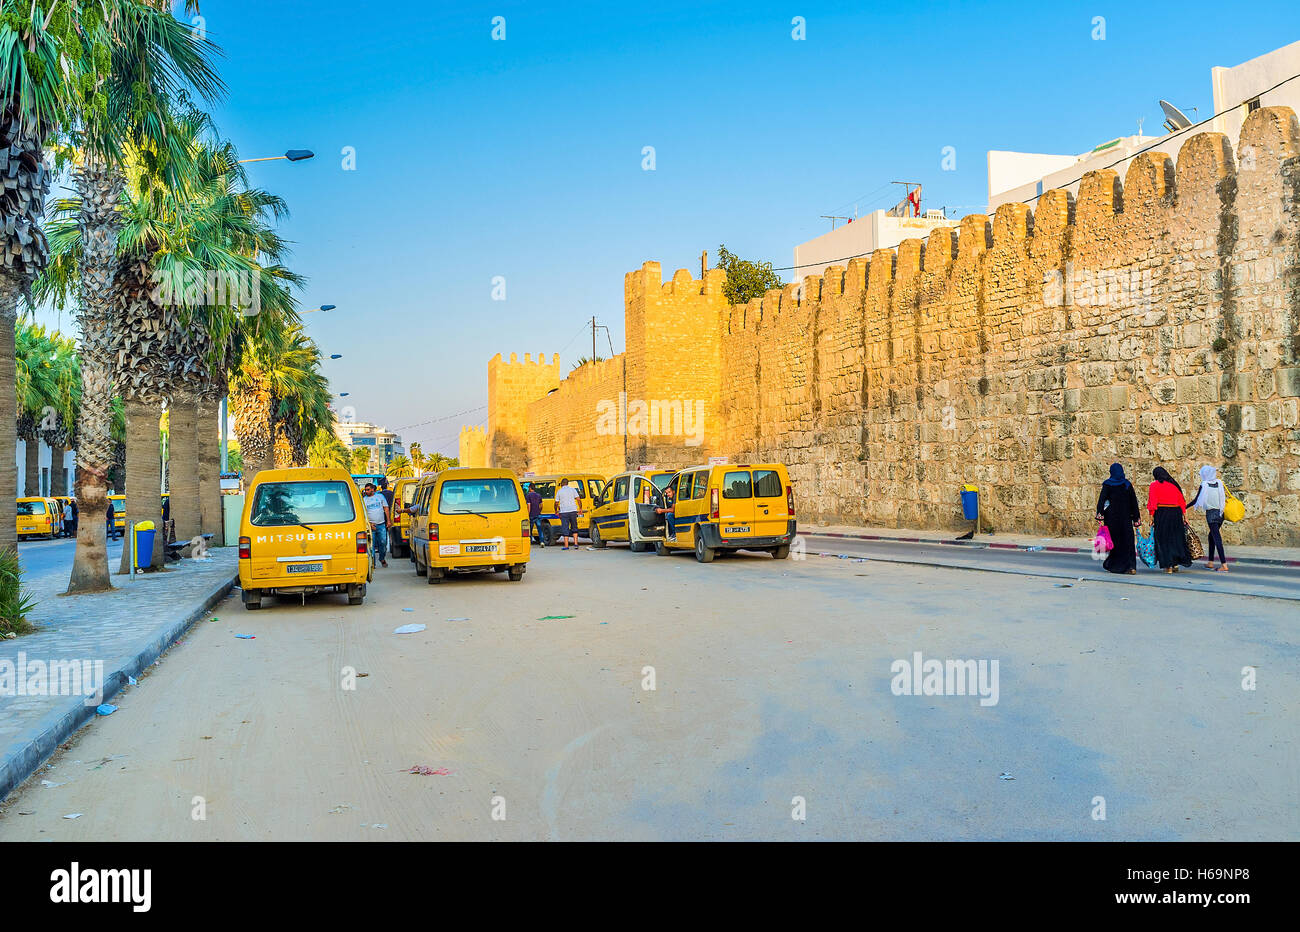 The noisy and crowded minibuses stop next to Medina walls Stock Photo